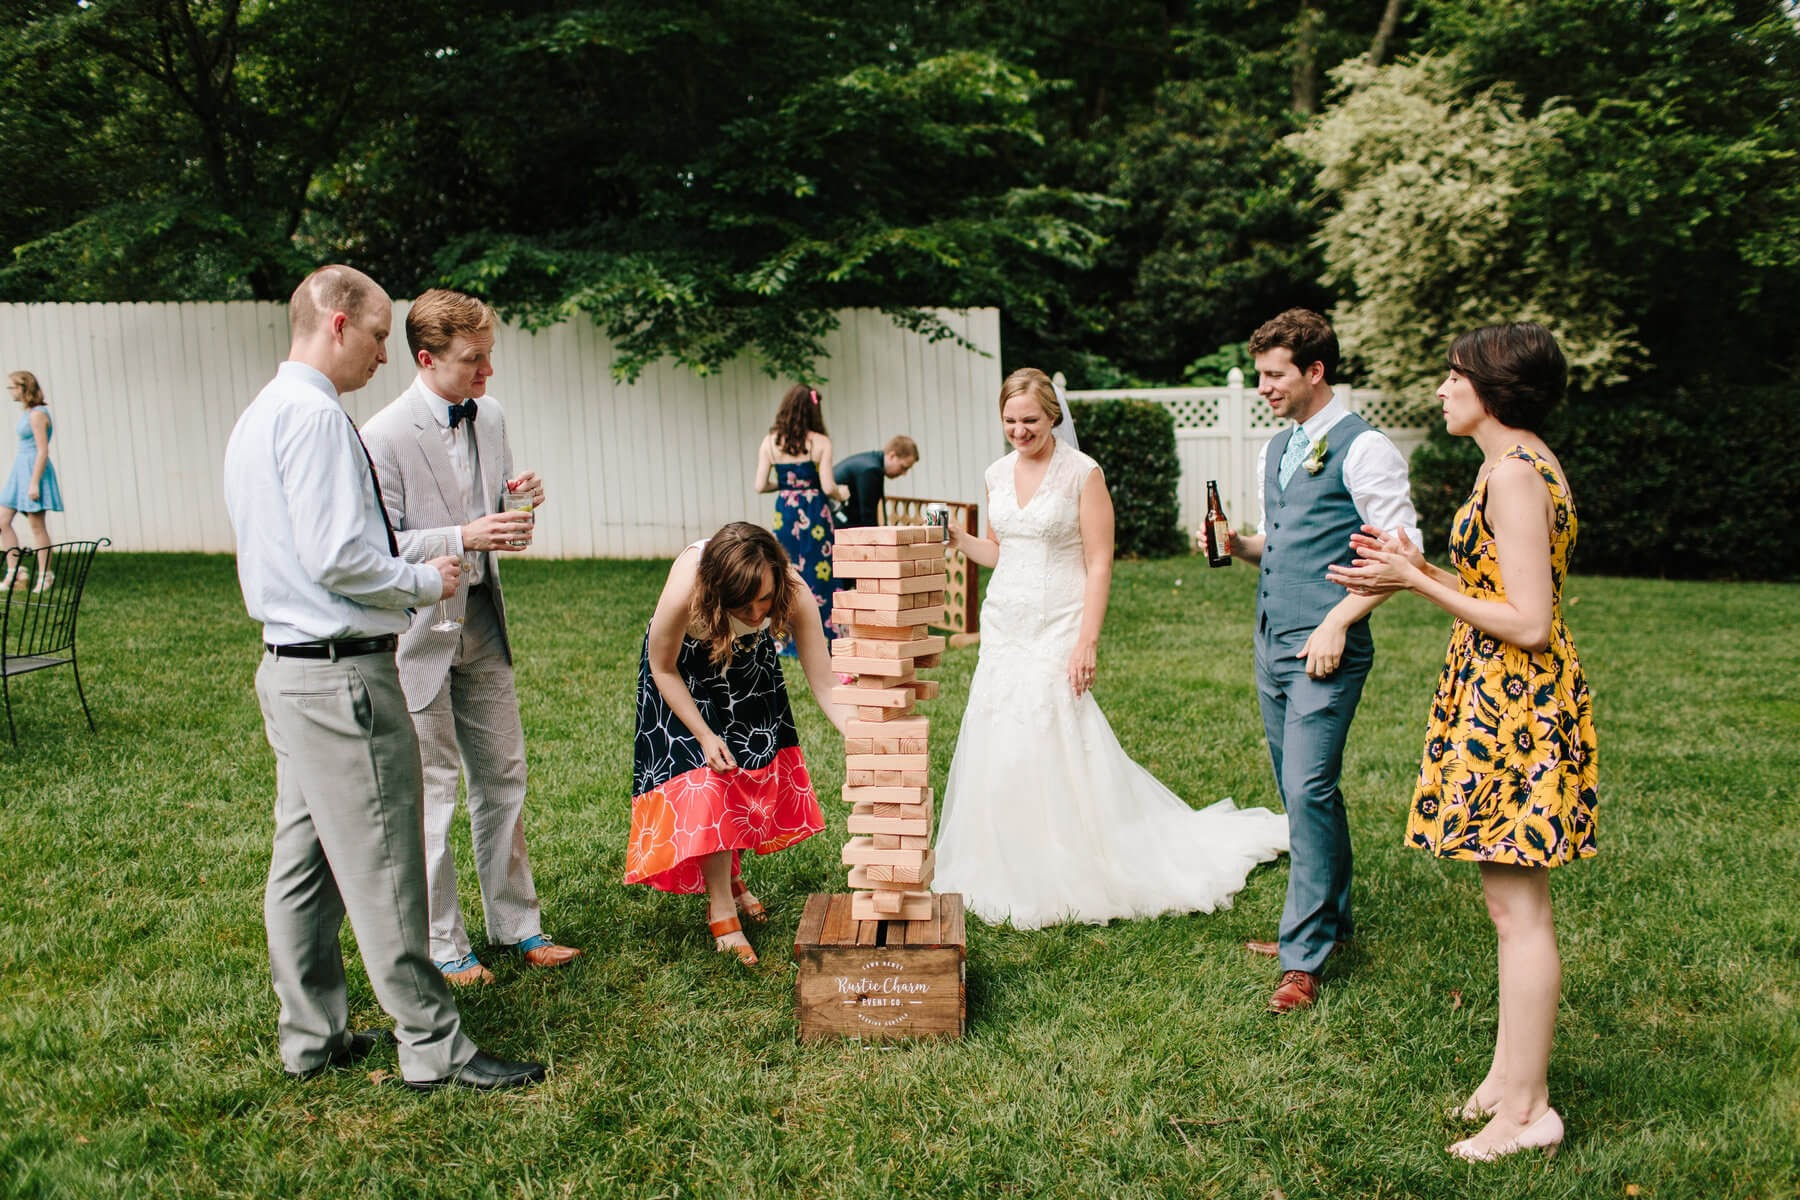 wedding party playing jenga